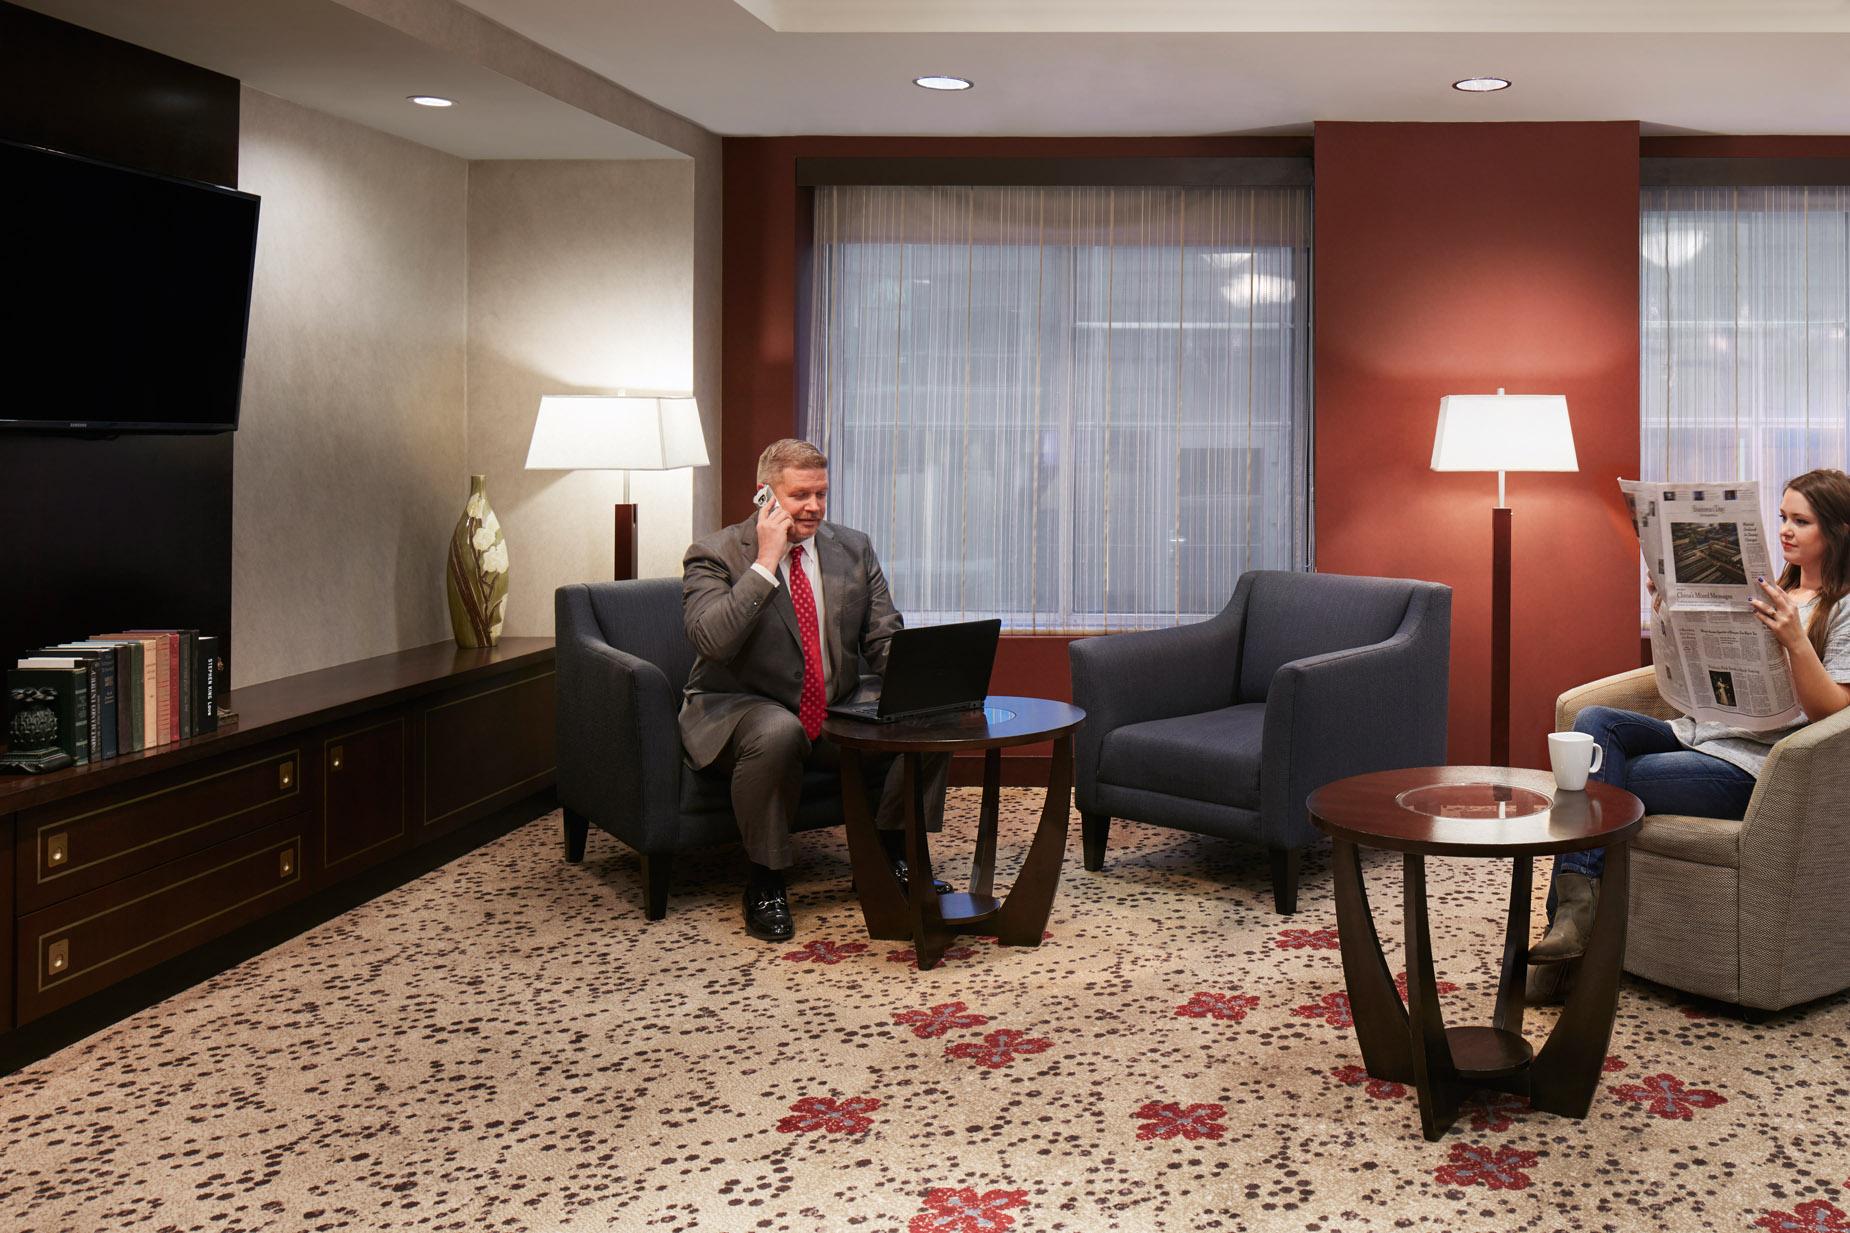 Club Quarters Hotel in Washington DC  A Business